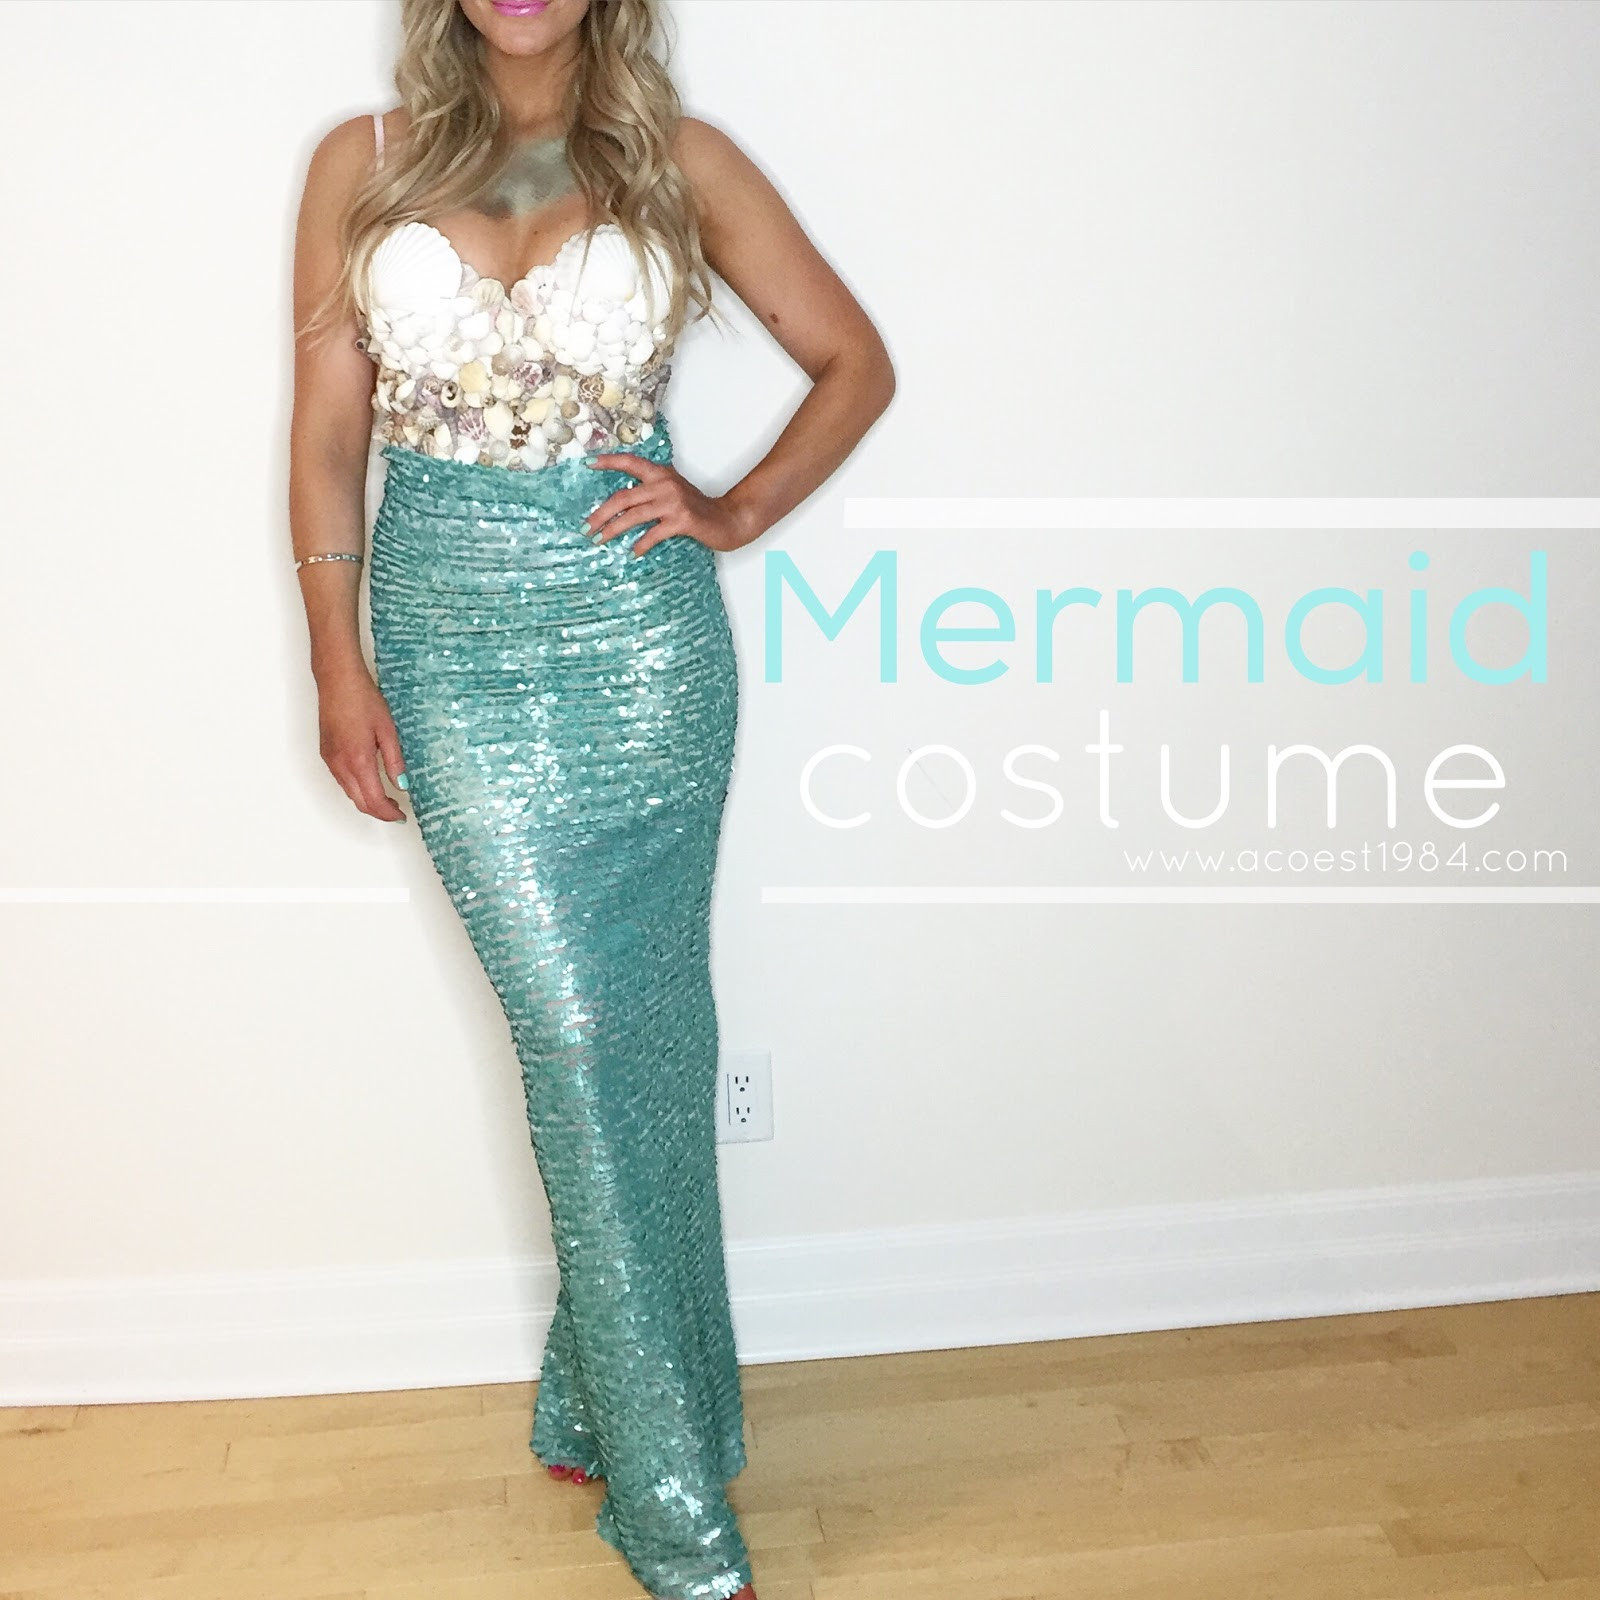 Mermaid DIY Costumes  Inexpensive DIY Mermaid Costume